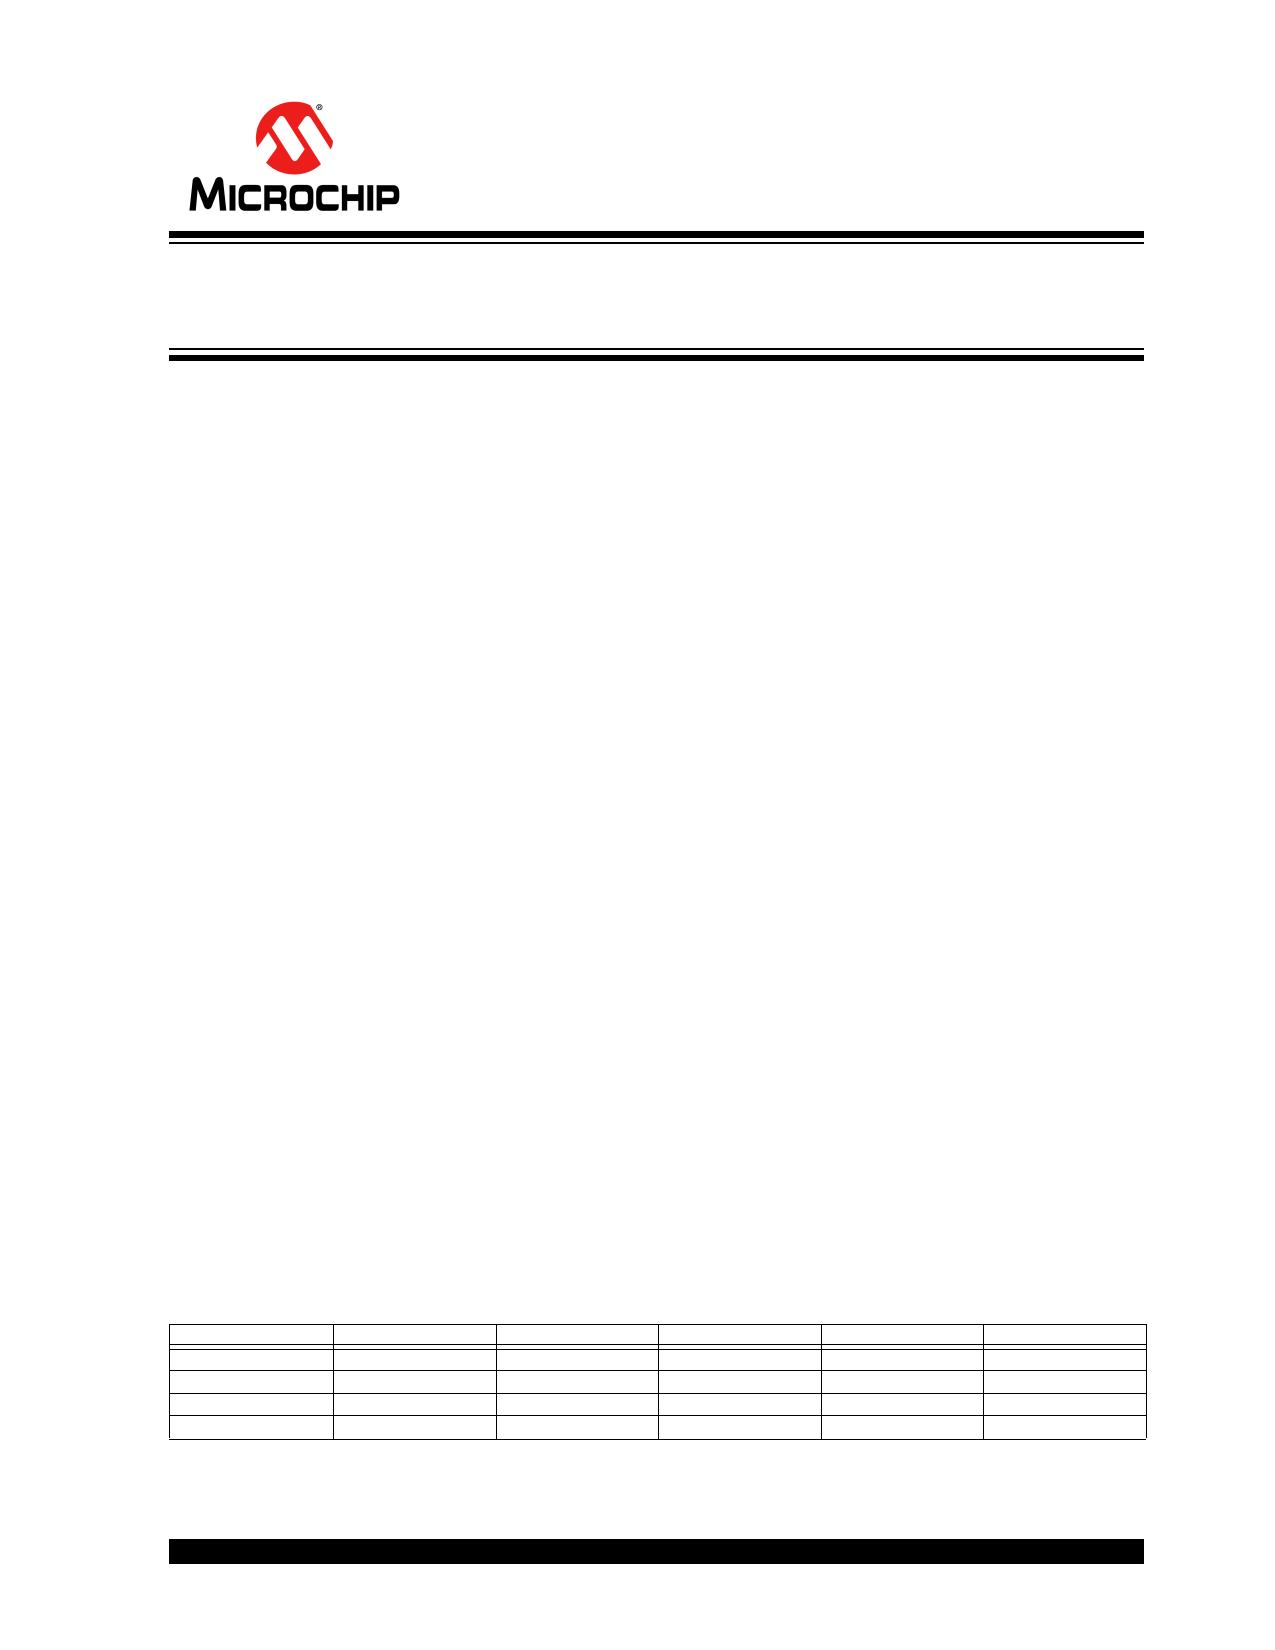 PIC24HJ128GP202 데이터시트 및 PIC24HJ128GP202 PDF